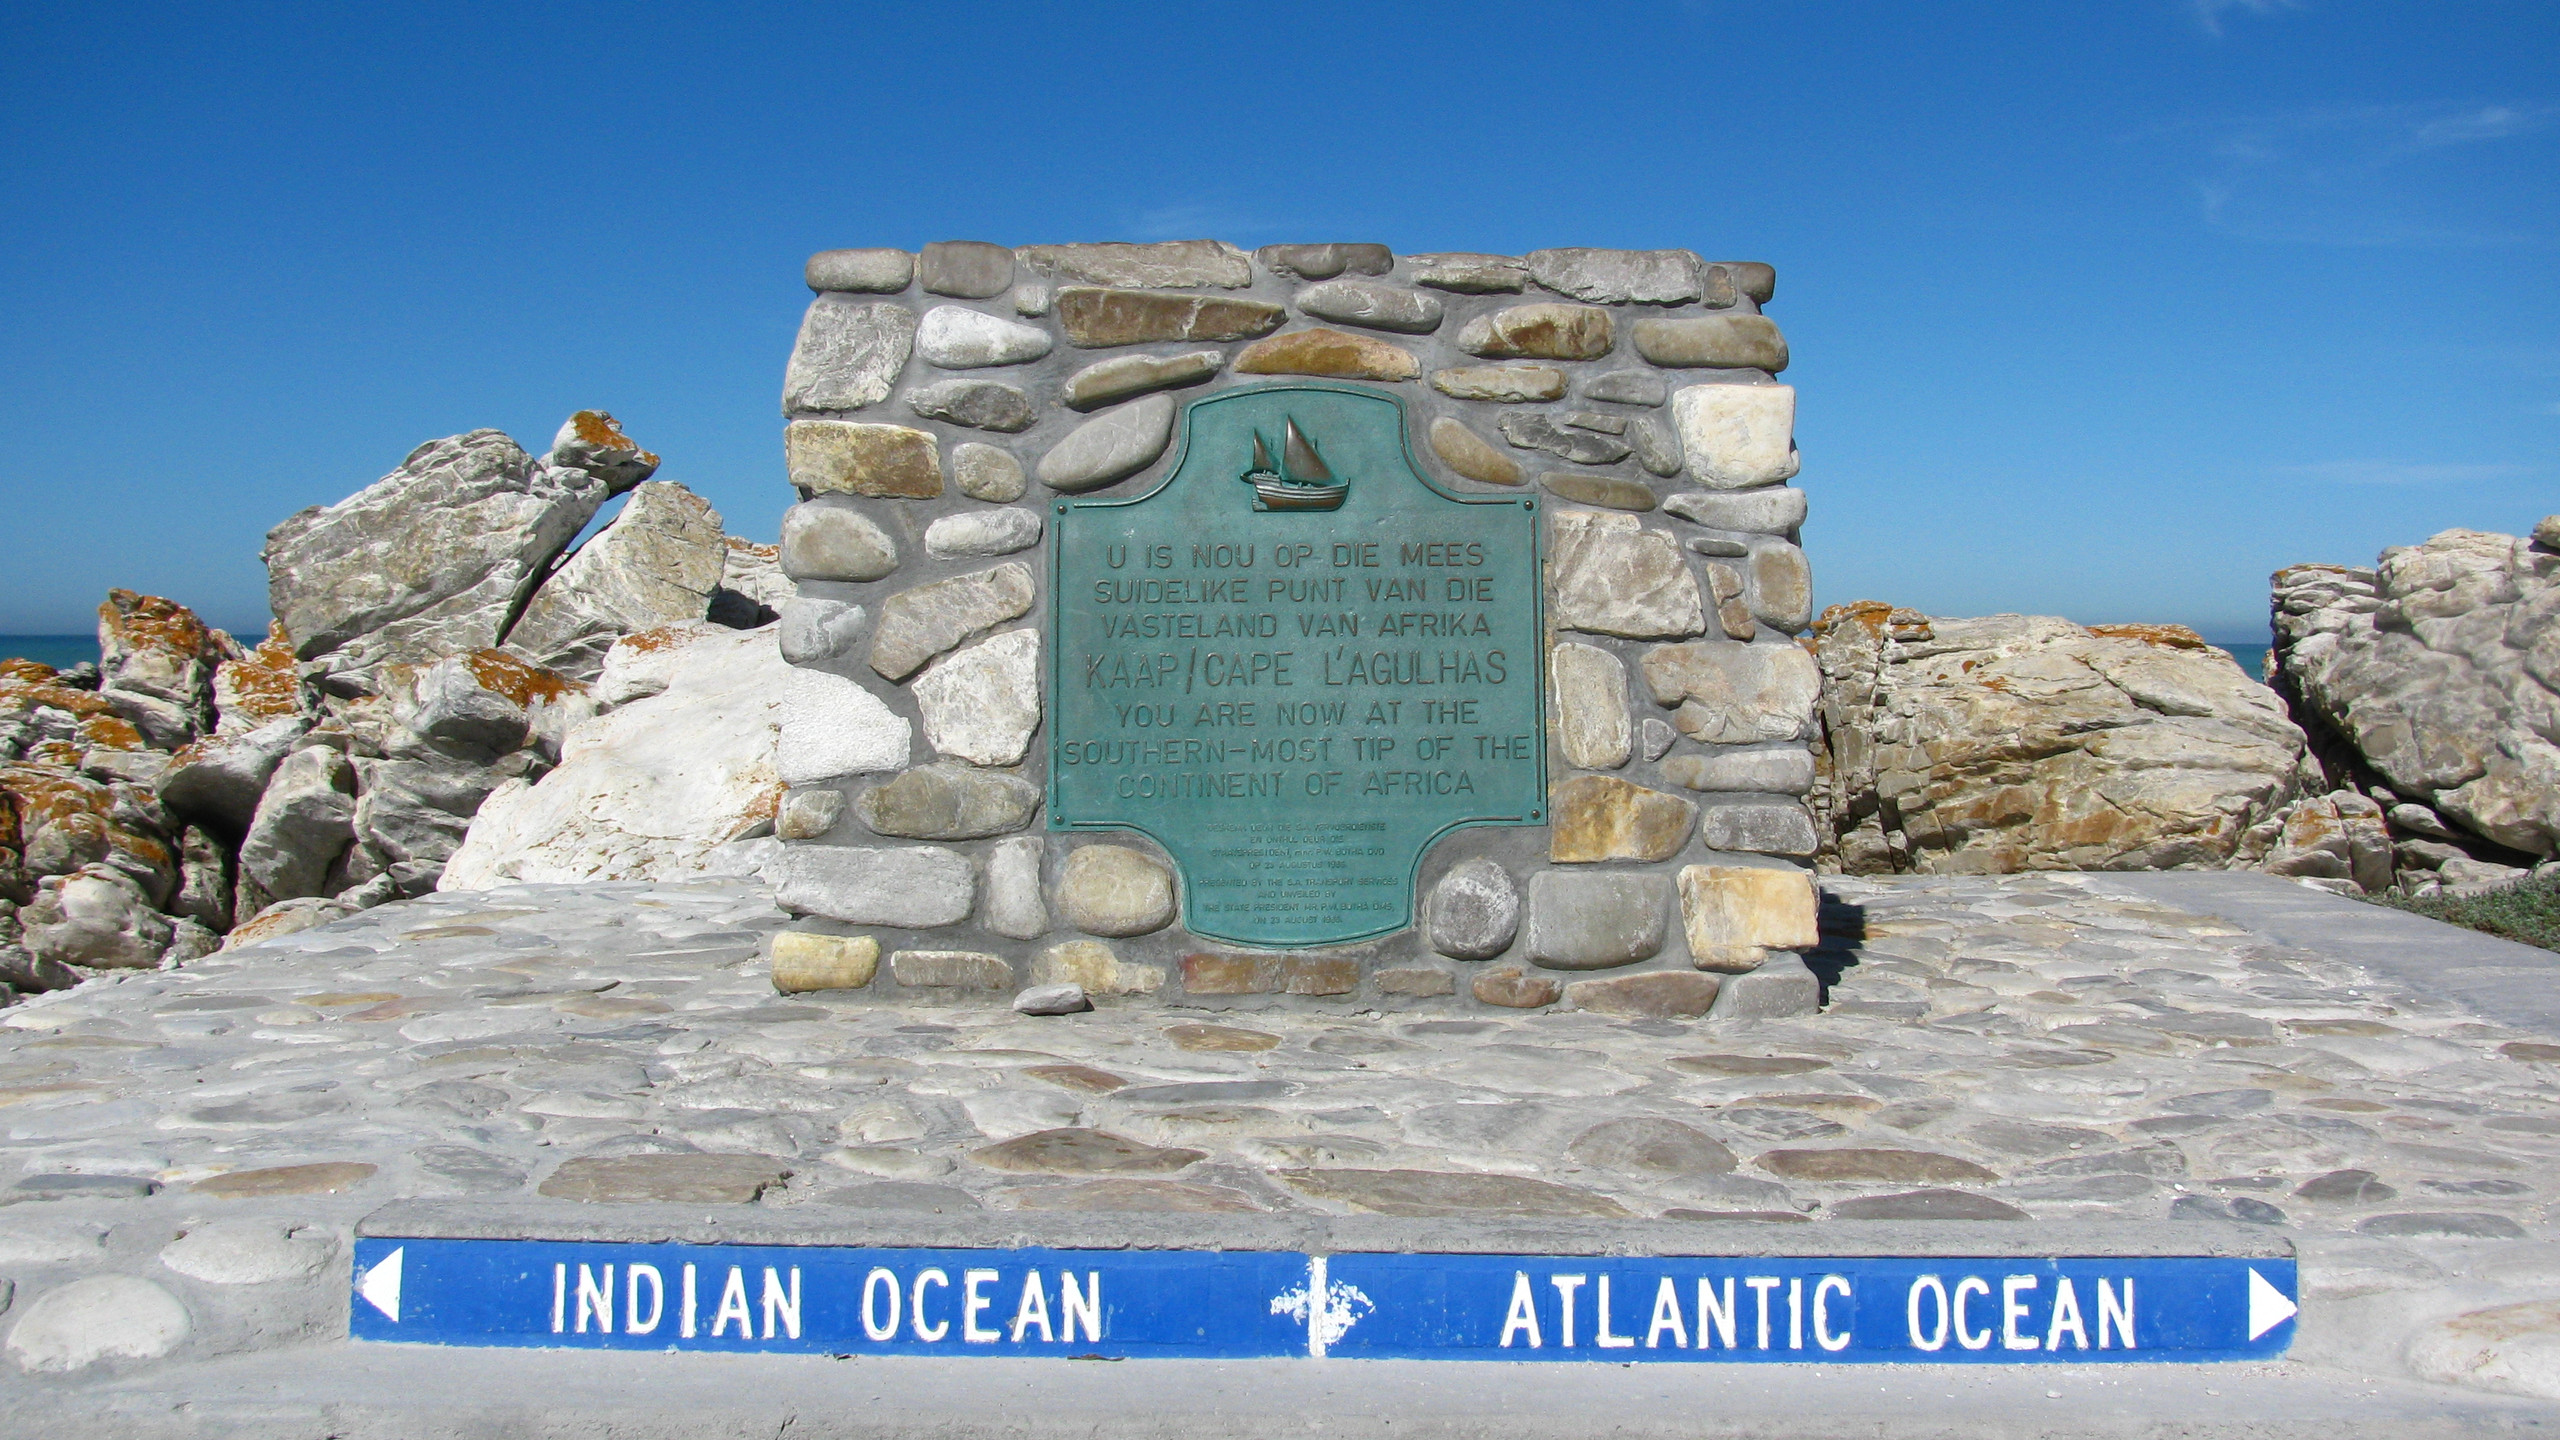 Cape Agulhas -where 2 oceans meet